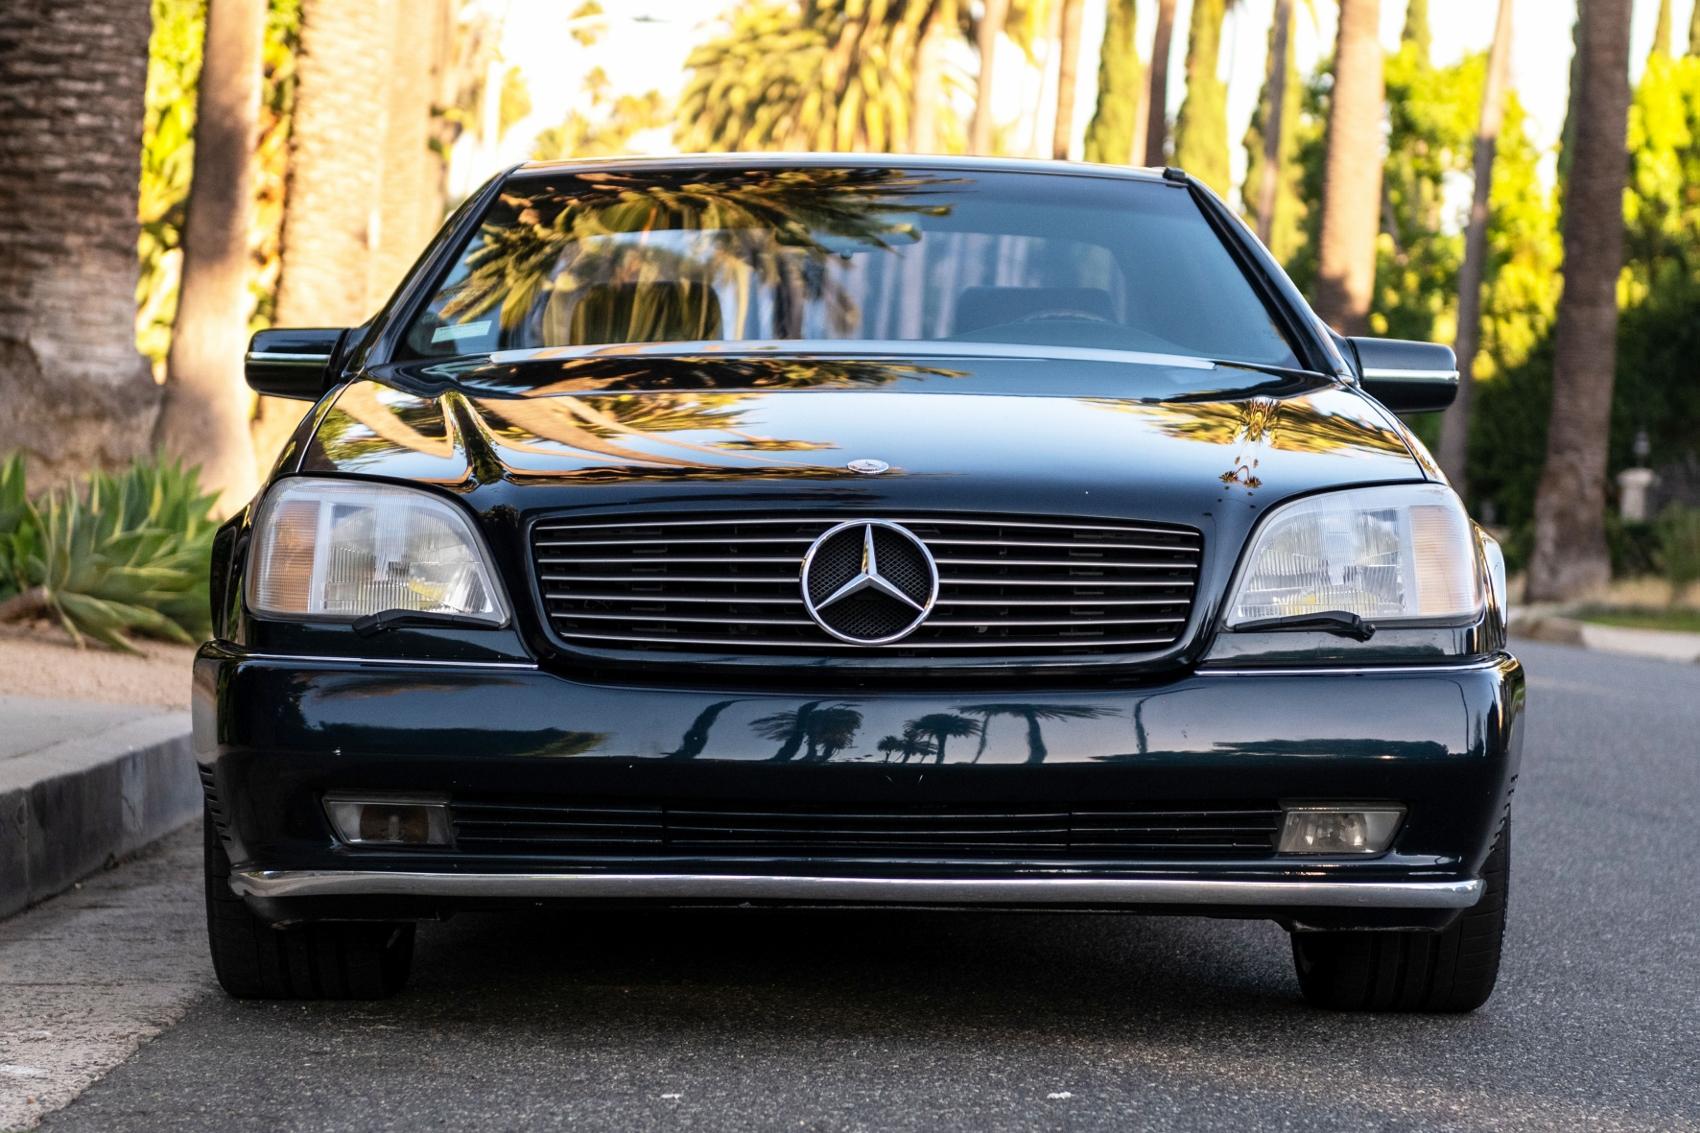 Pozrite si Mercedes S600 Michaela Jordana z roku 1996 4aRdAUsvWA lorinsercl600ex-jordanfront2sbeverl